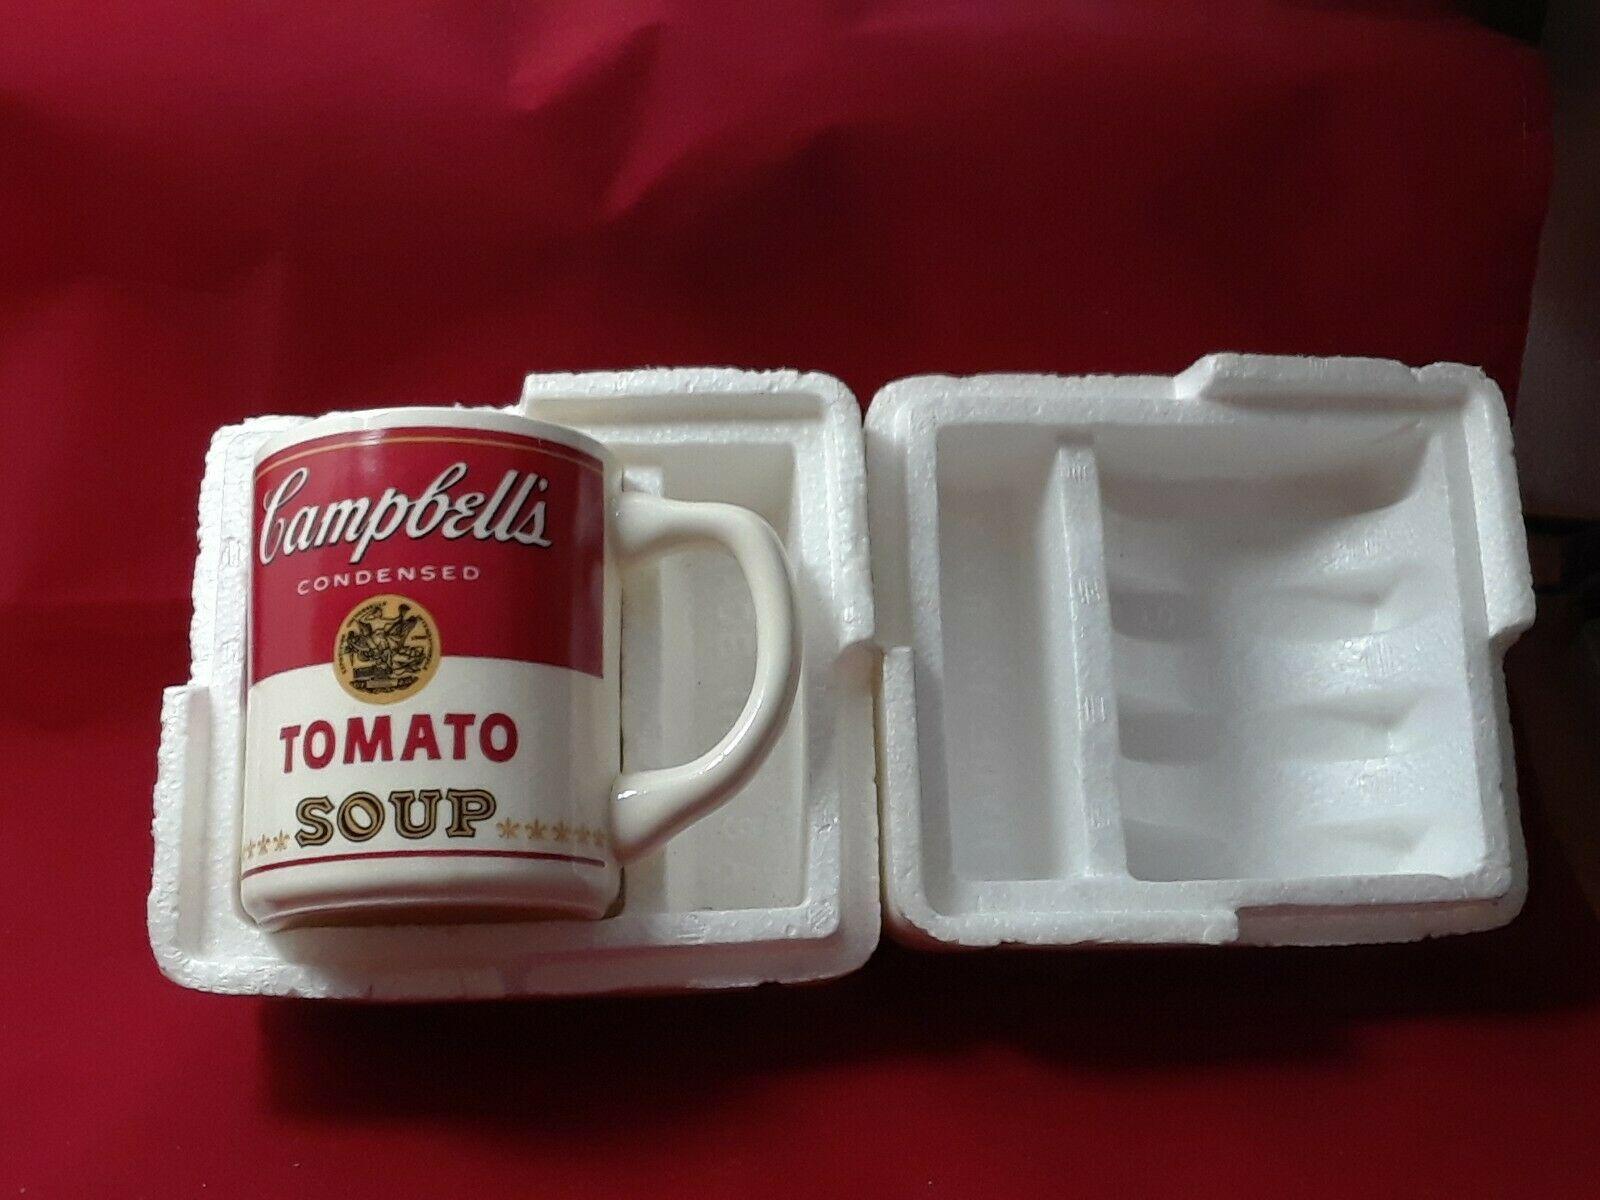 Collectible Campbell's Tomato Soup Mug Cup 8 oz in The Original Styrofoam Mailer